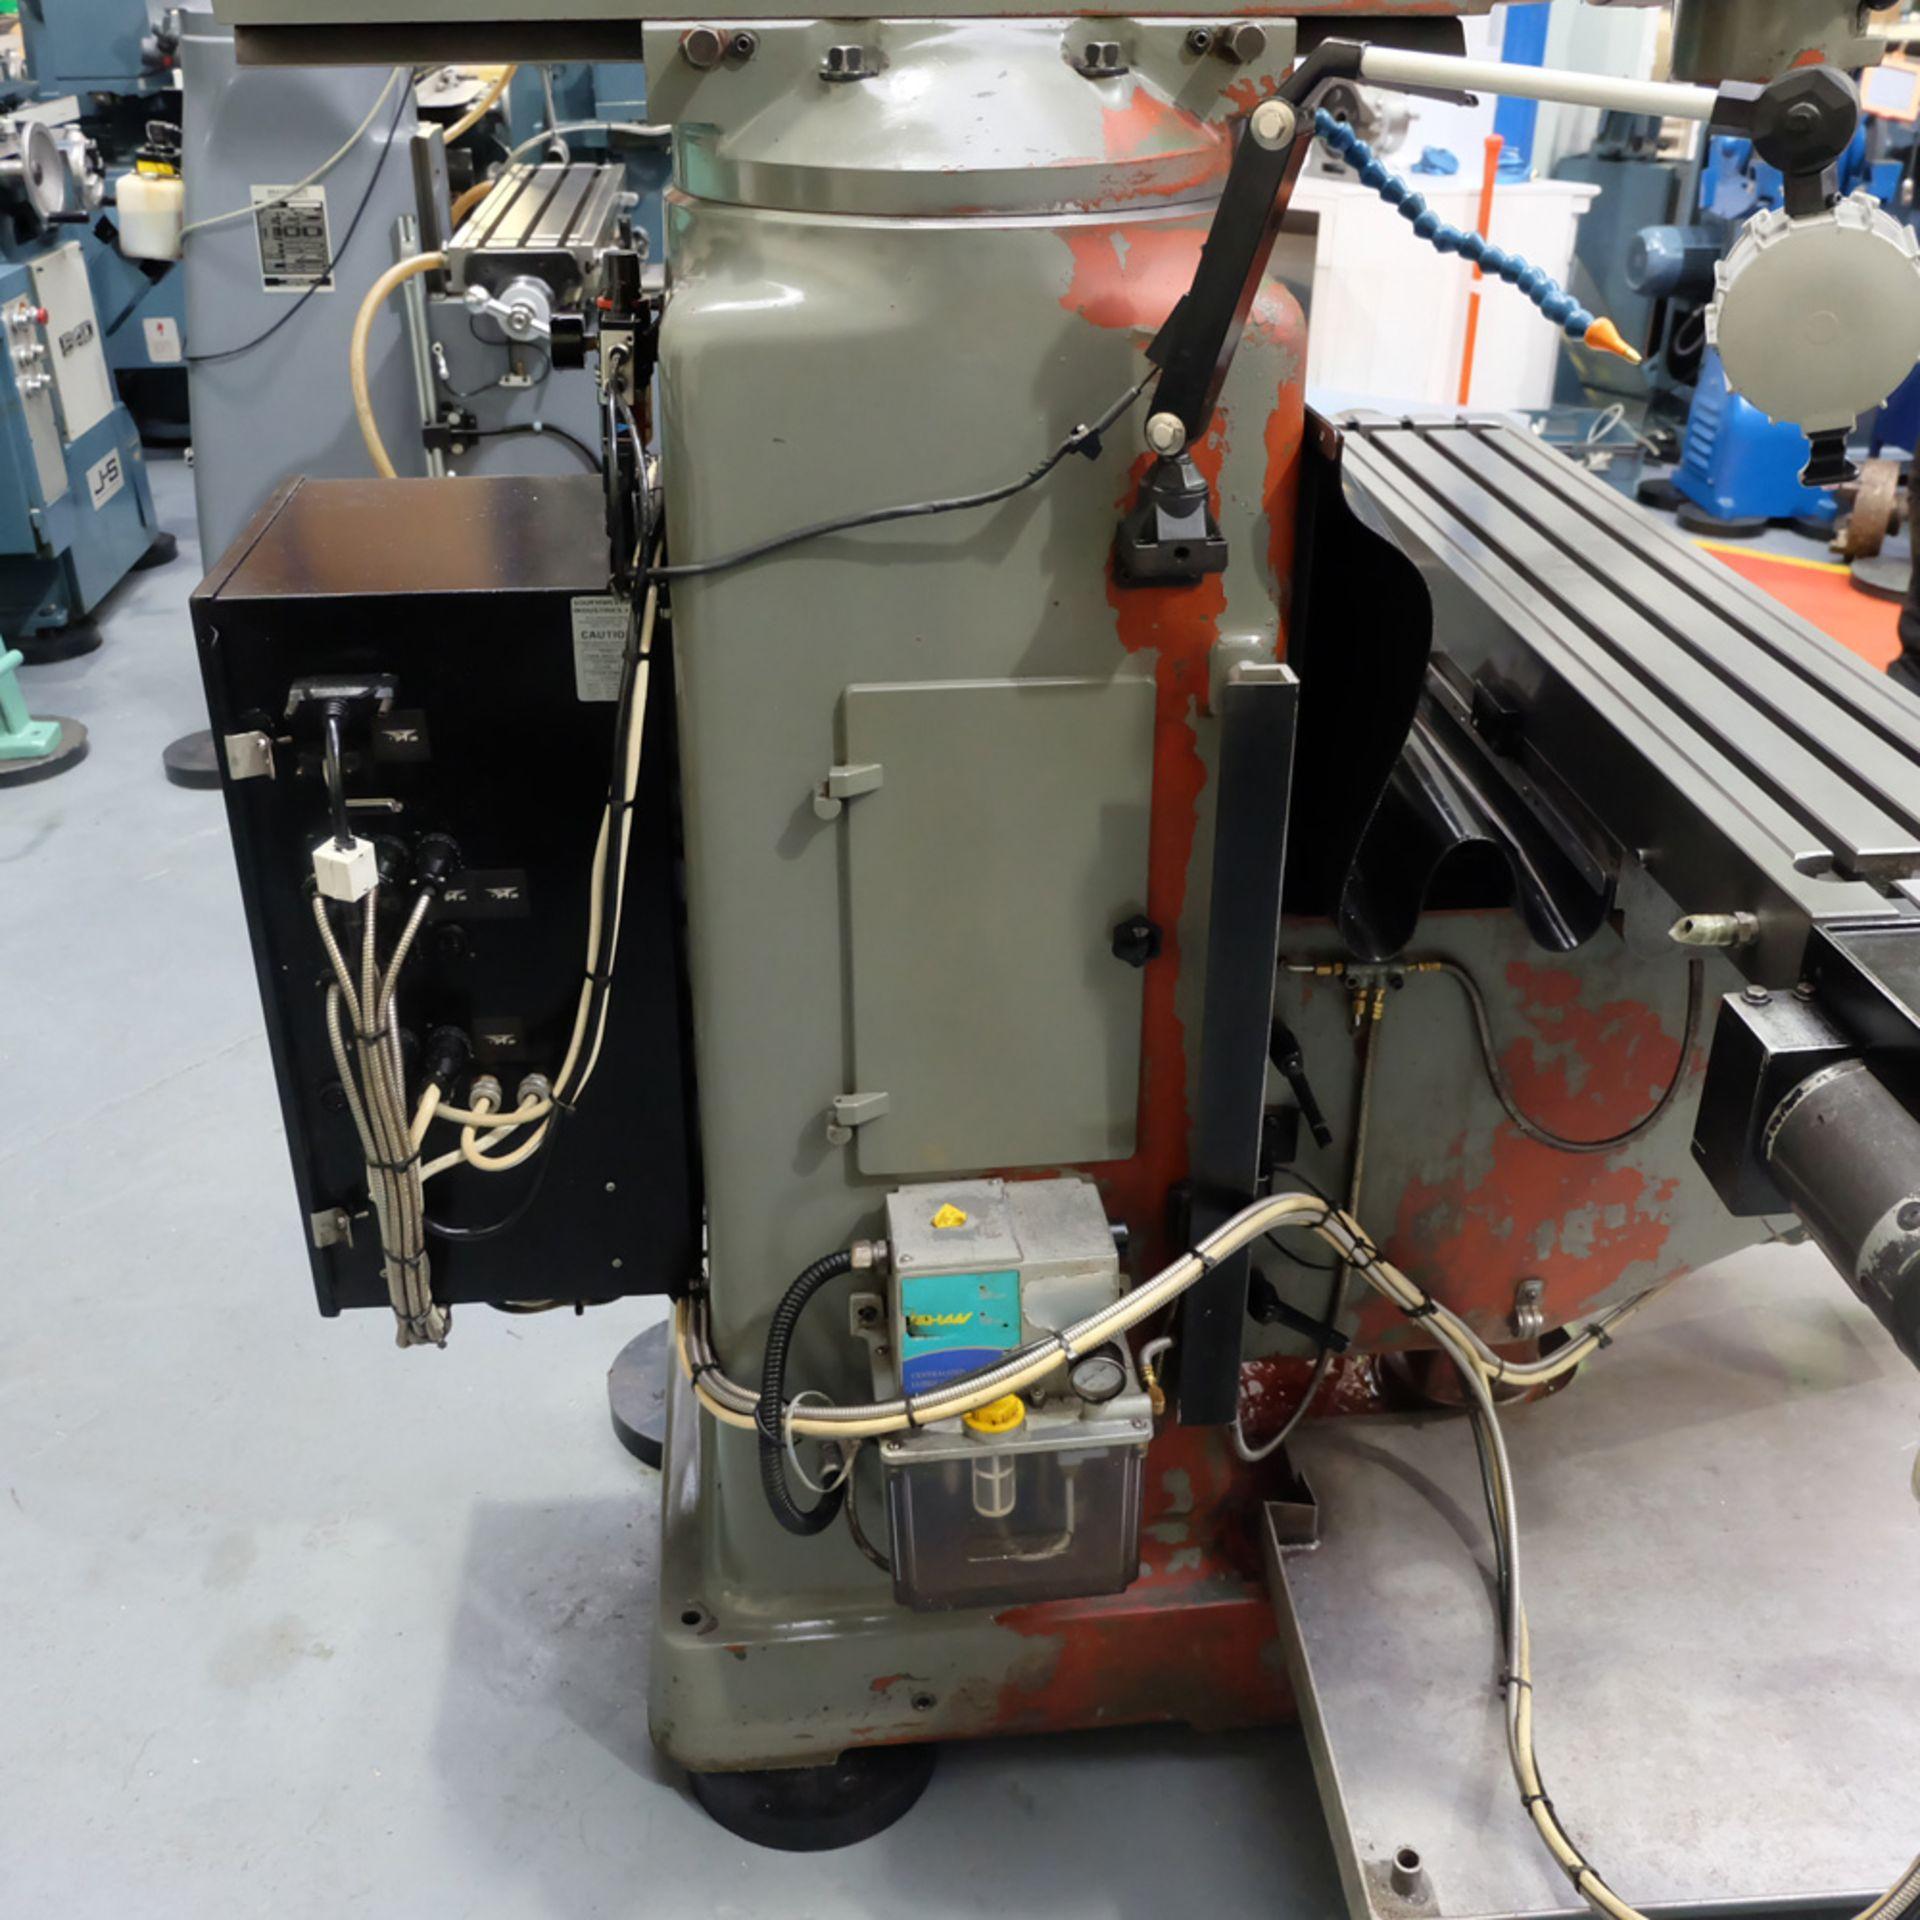 Lot 20 - KRV Pro 2000: Turret Milling Machine.